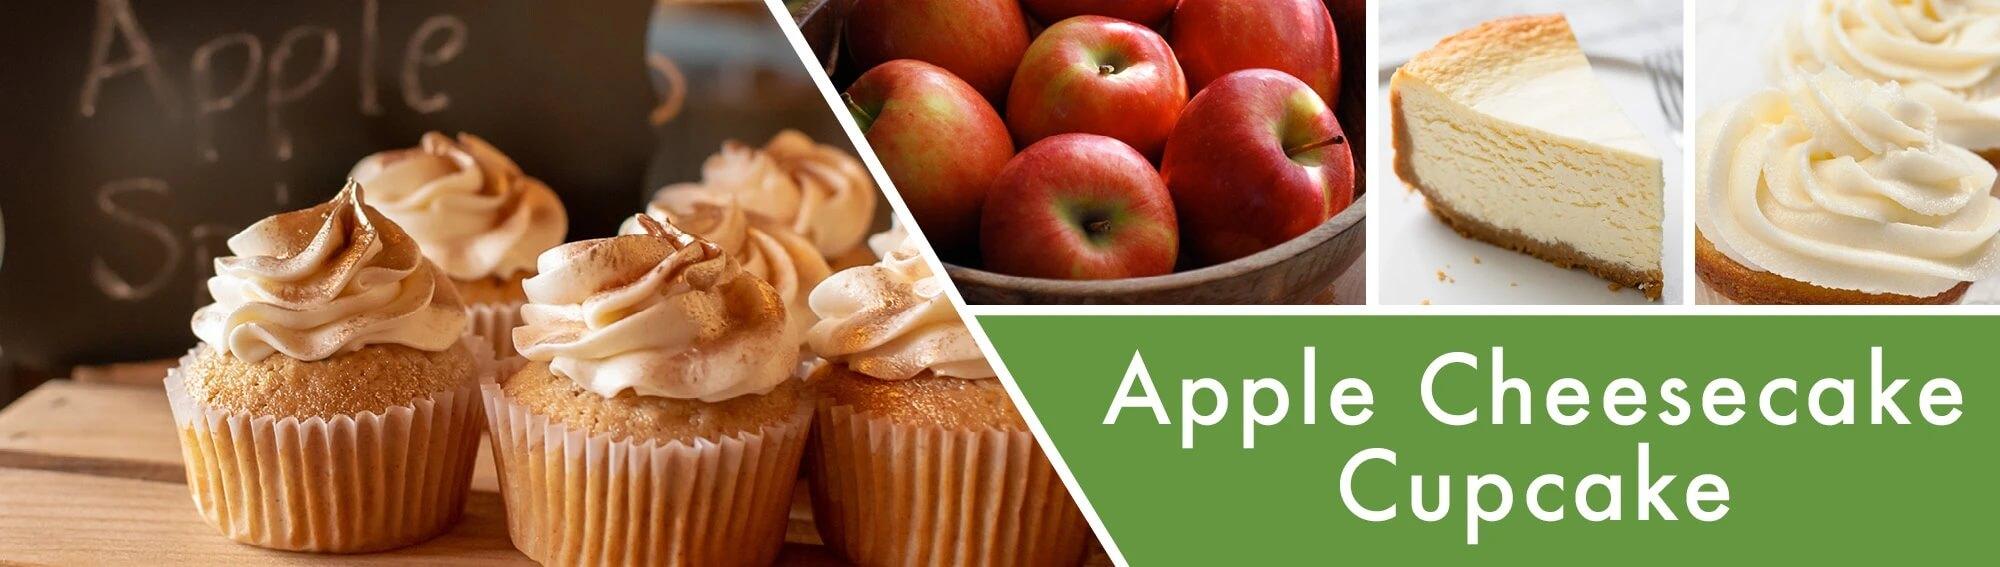 Apple-Cheesecake-Cupcake-BannerE2lOovqY1PefD